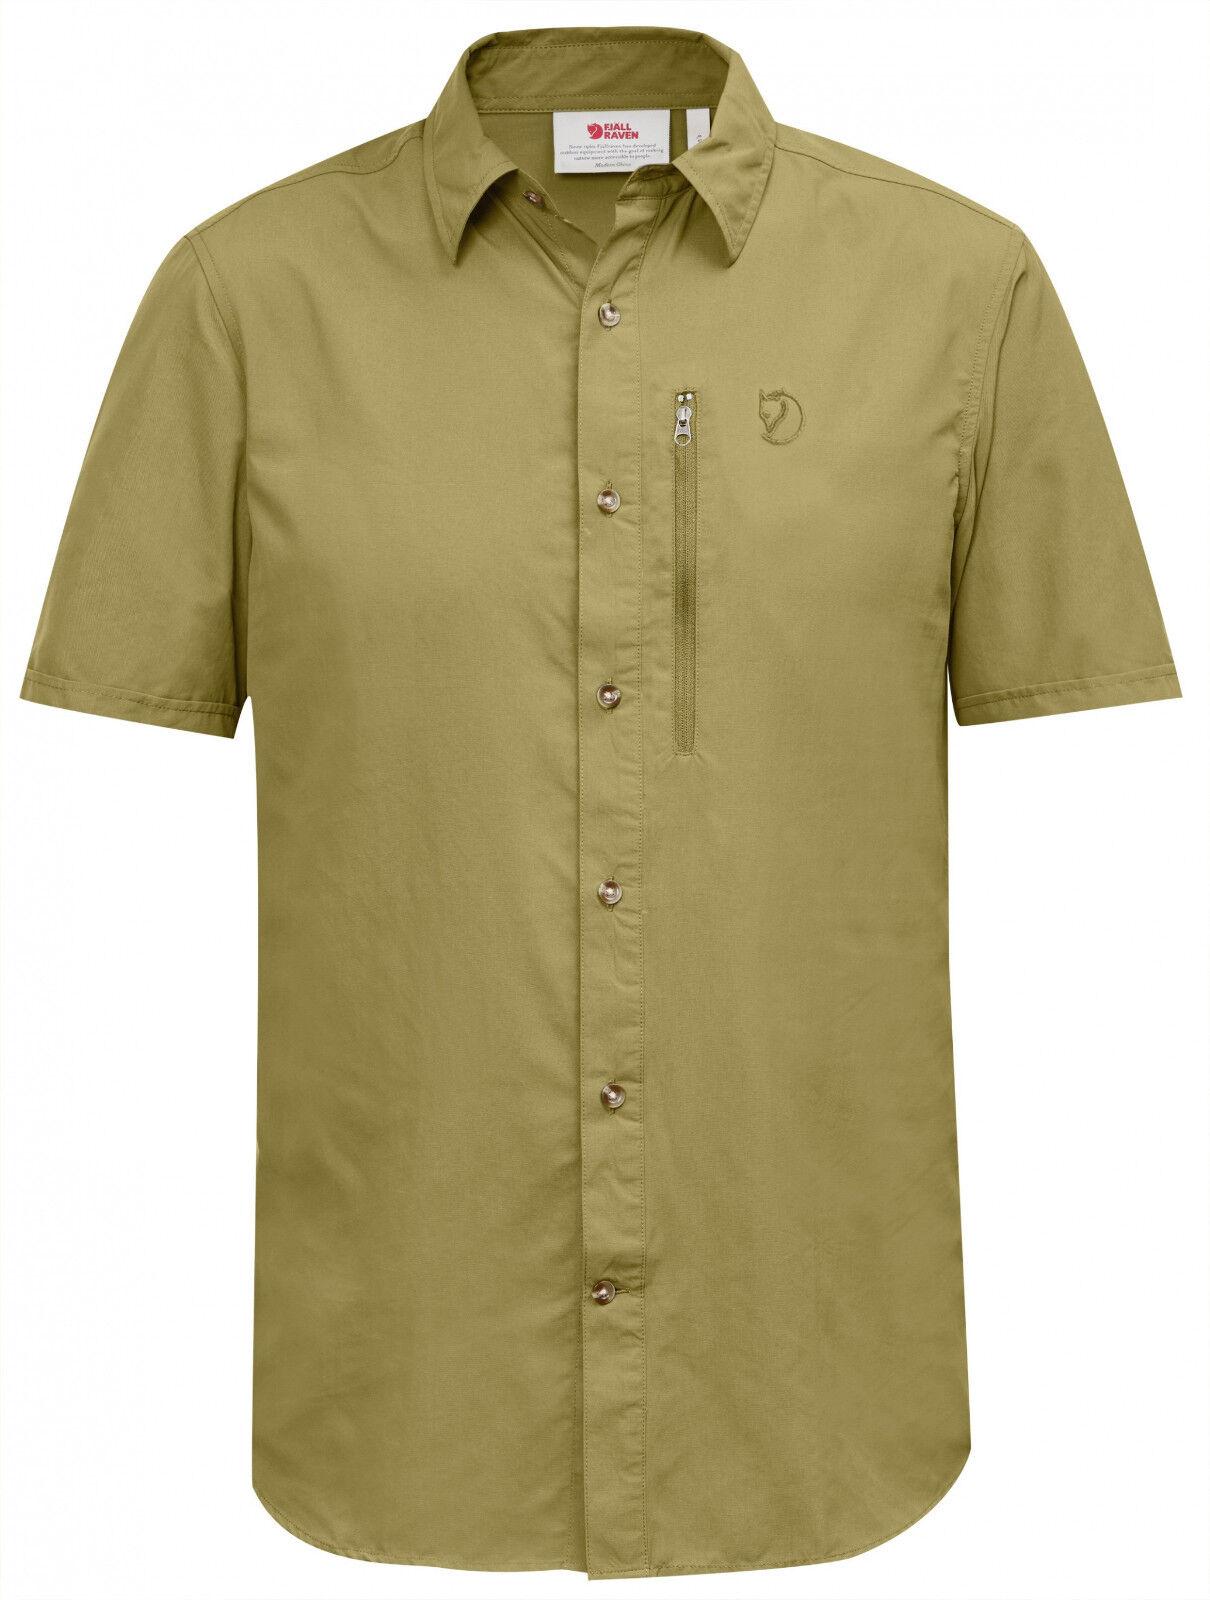 Fjallraven Abisko Hike Shirt SS - Willow